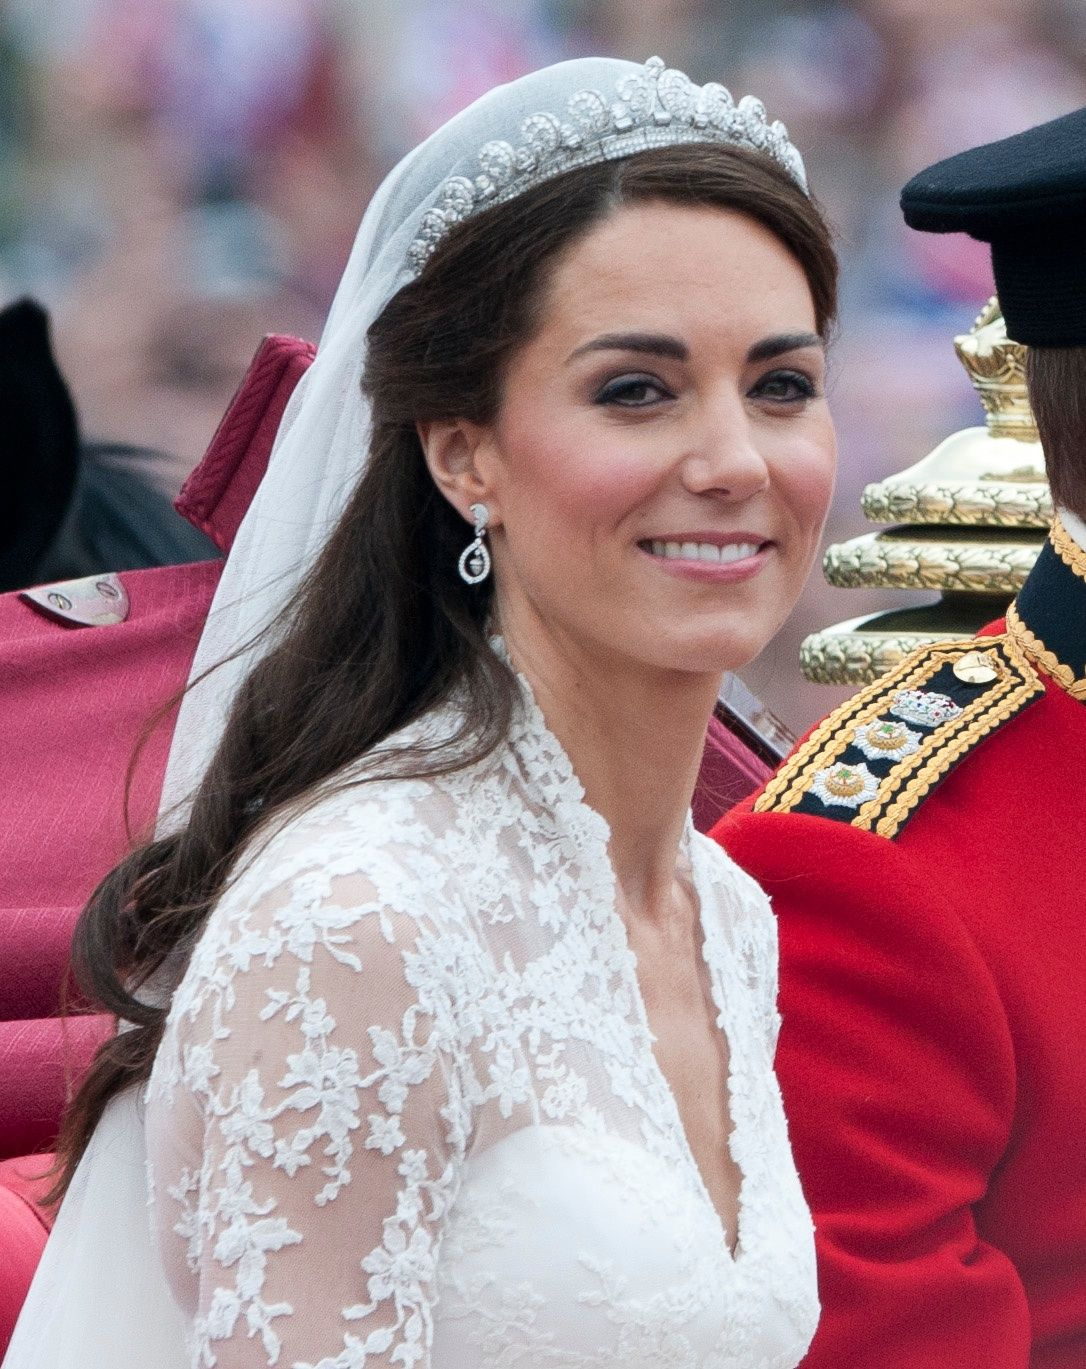 Meghan Markle S Royal Wedding Hair And Kate Middleton S Wedding Hair